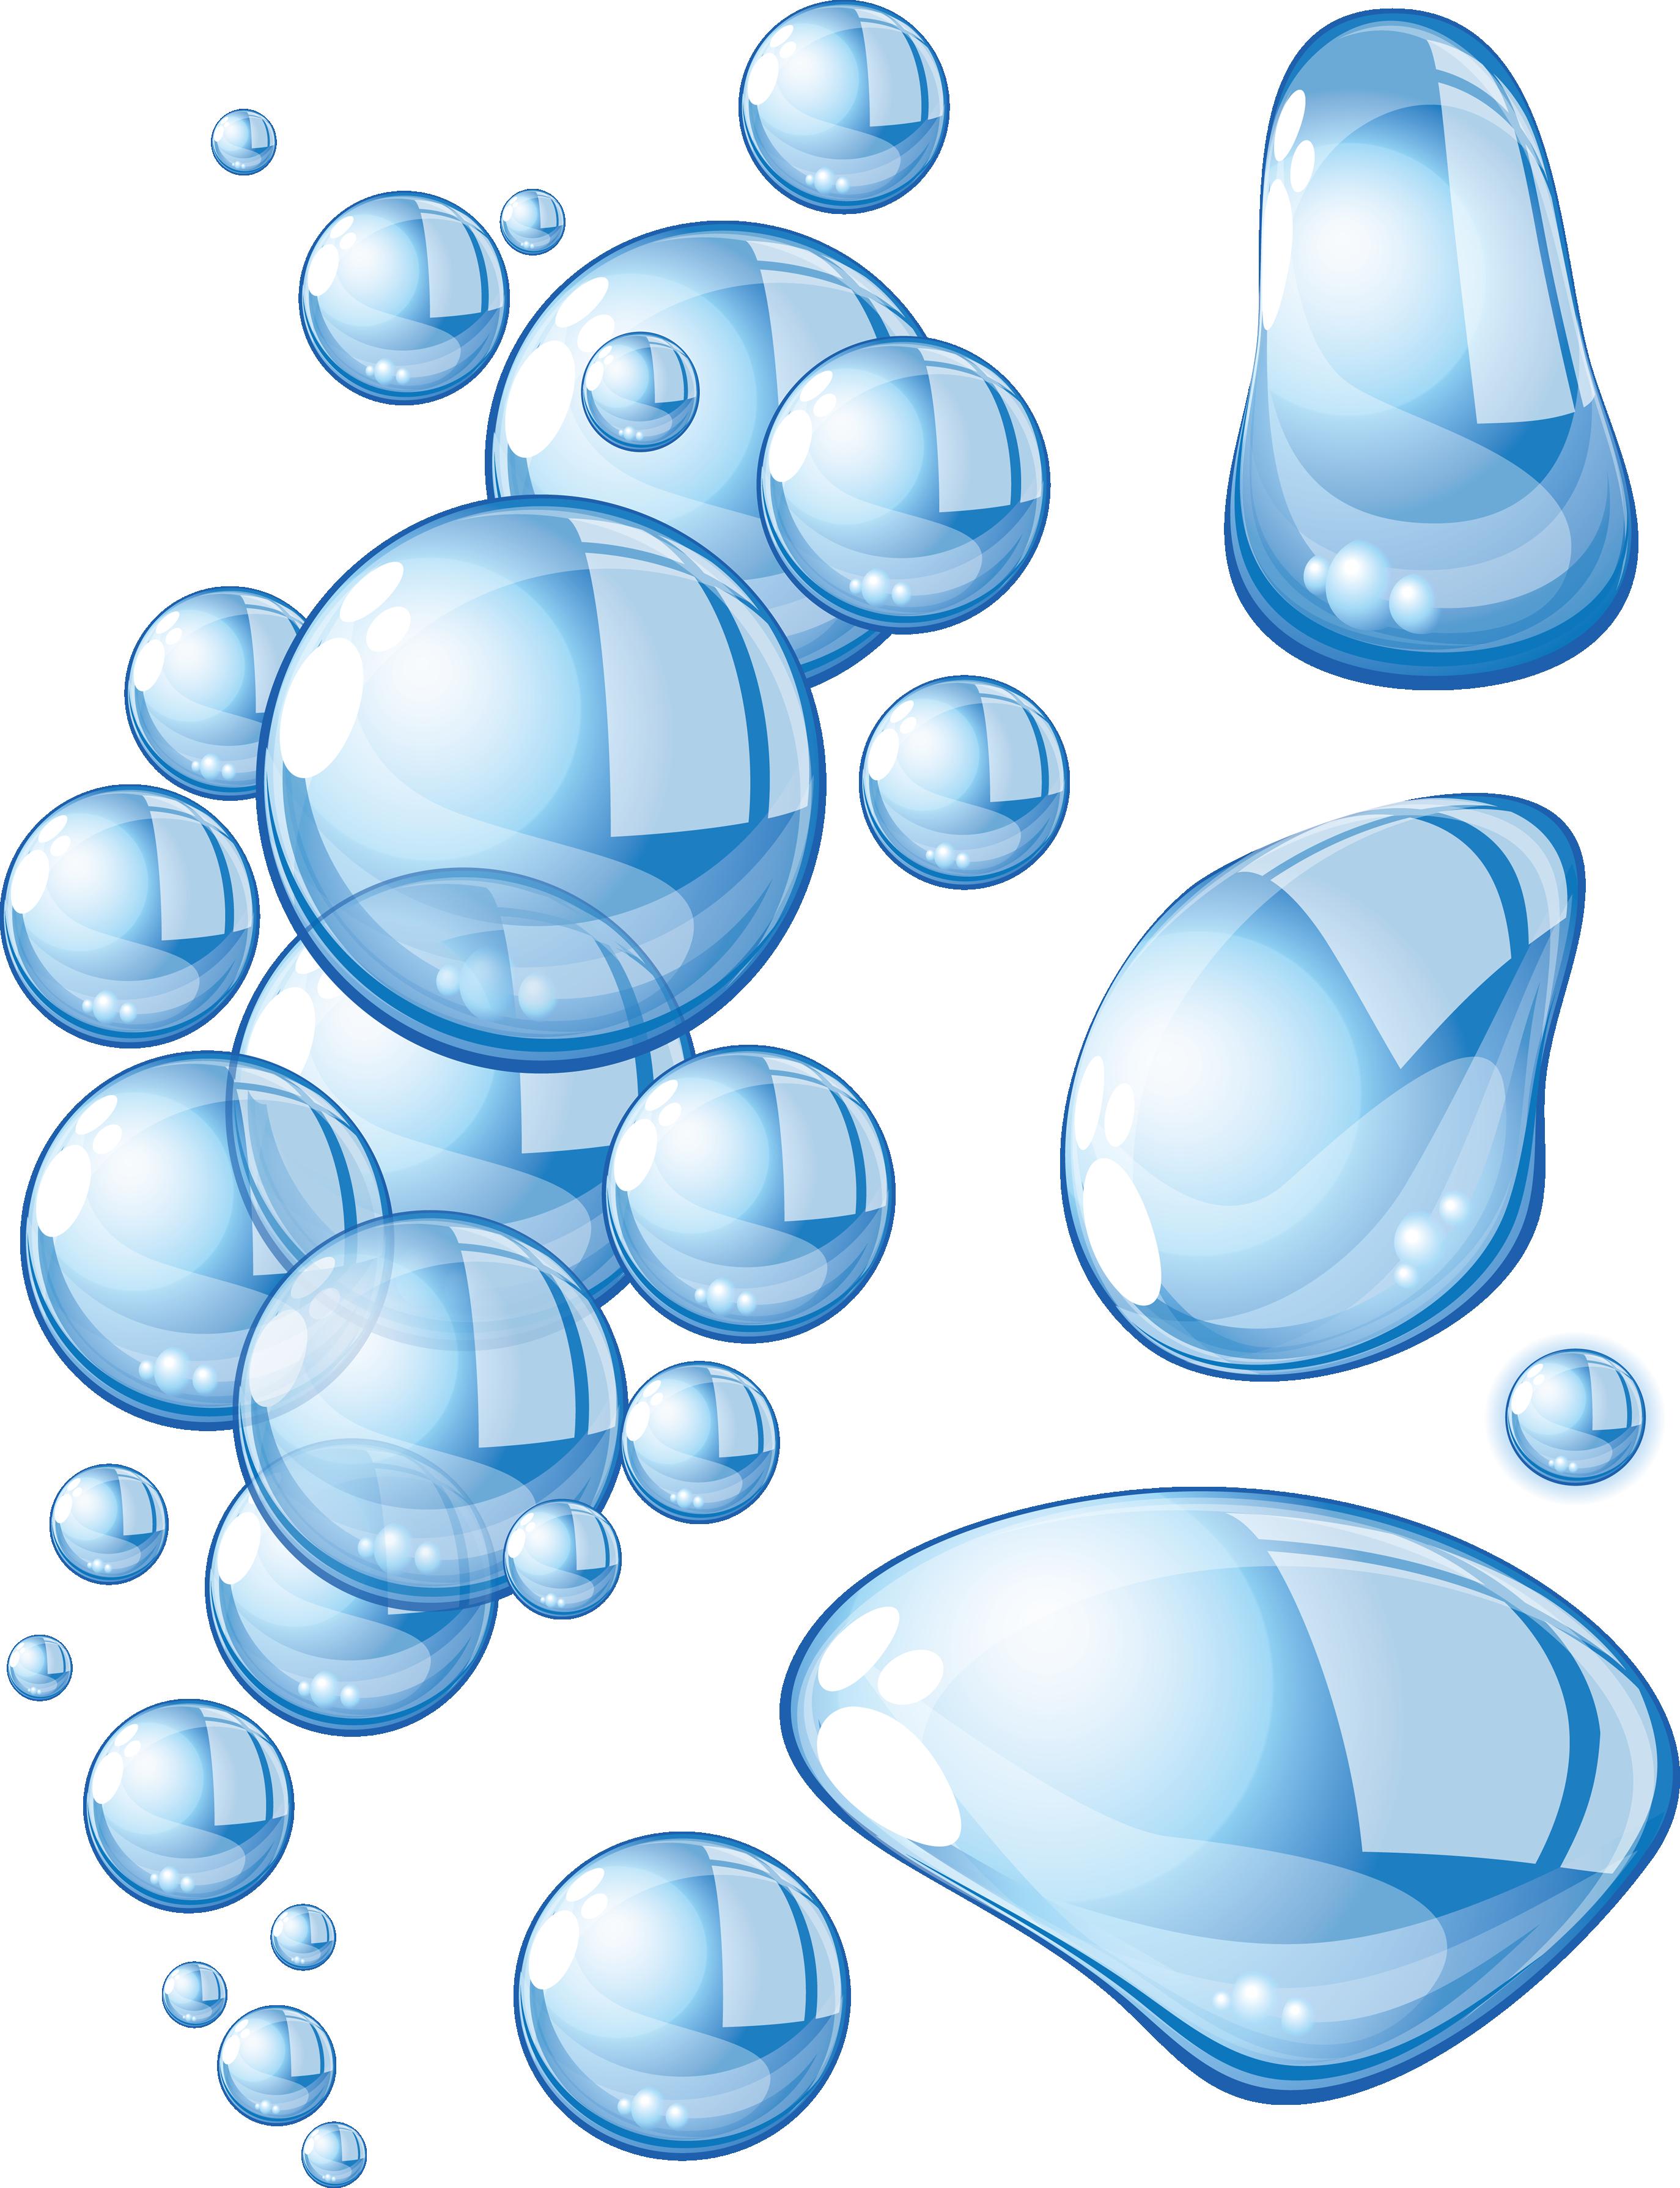 Water Drops PNG Image   Water Drops PNG Image image #790